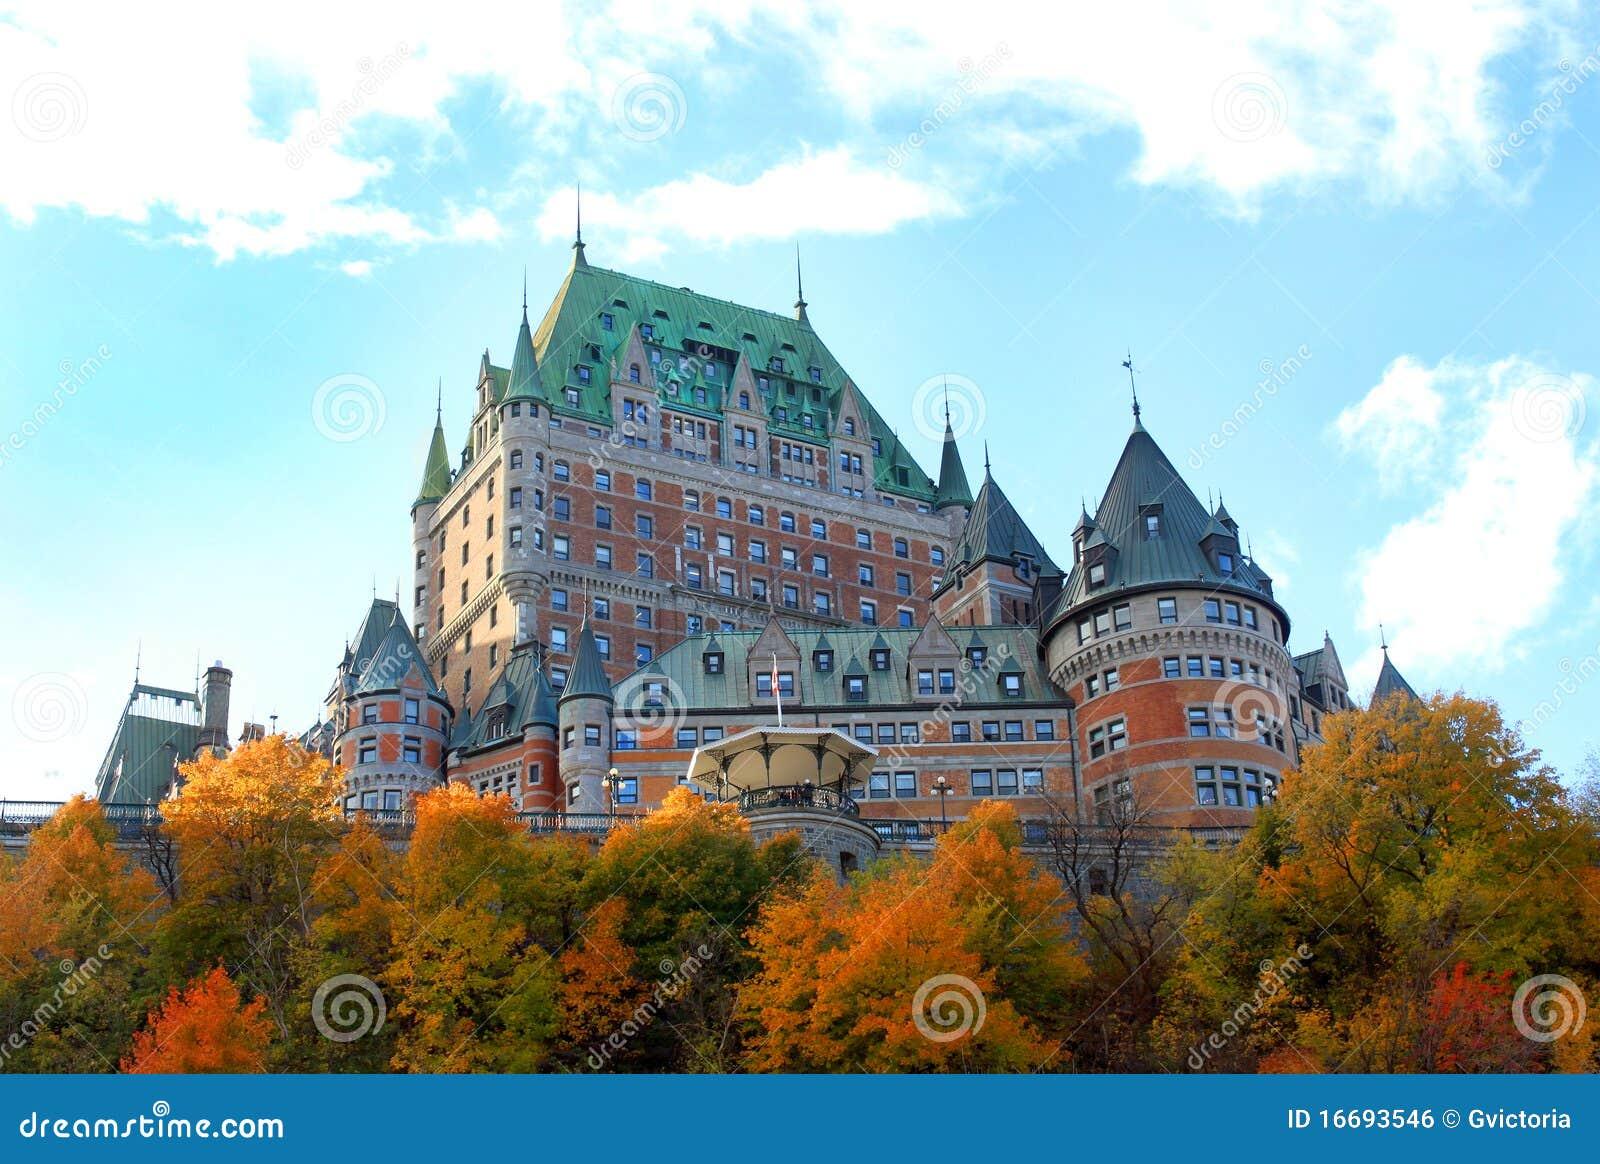 Château à Quebec City, Canada